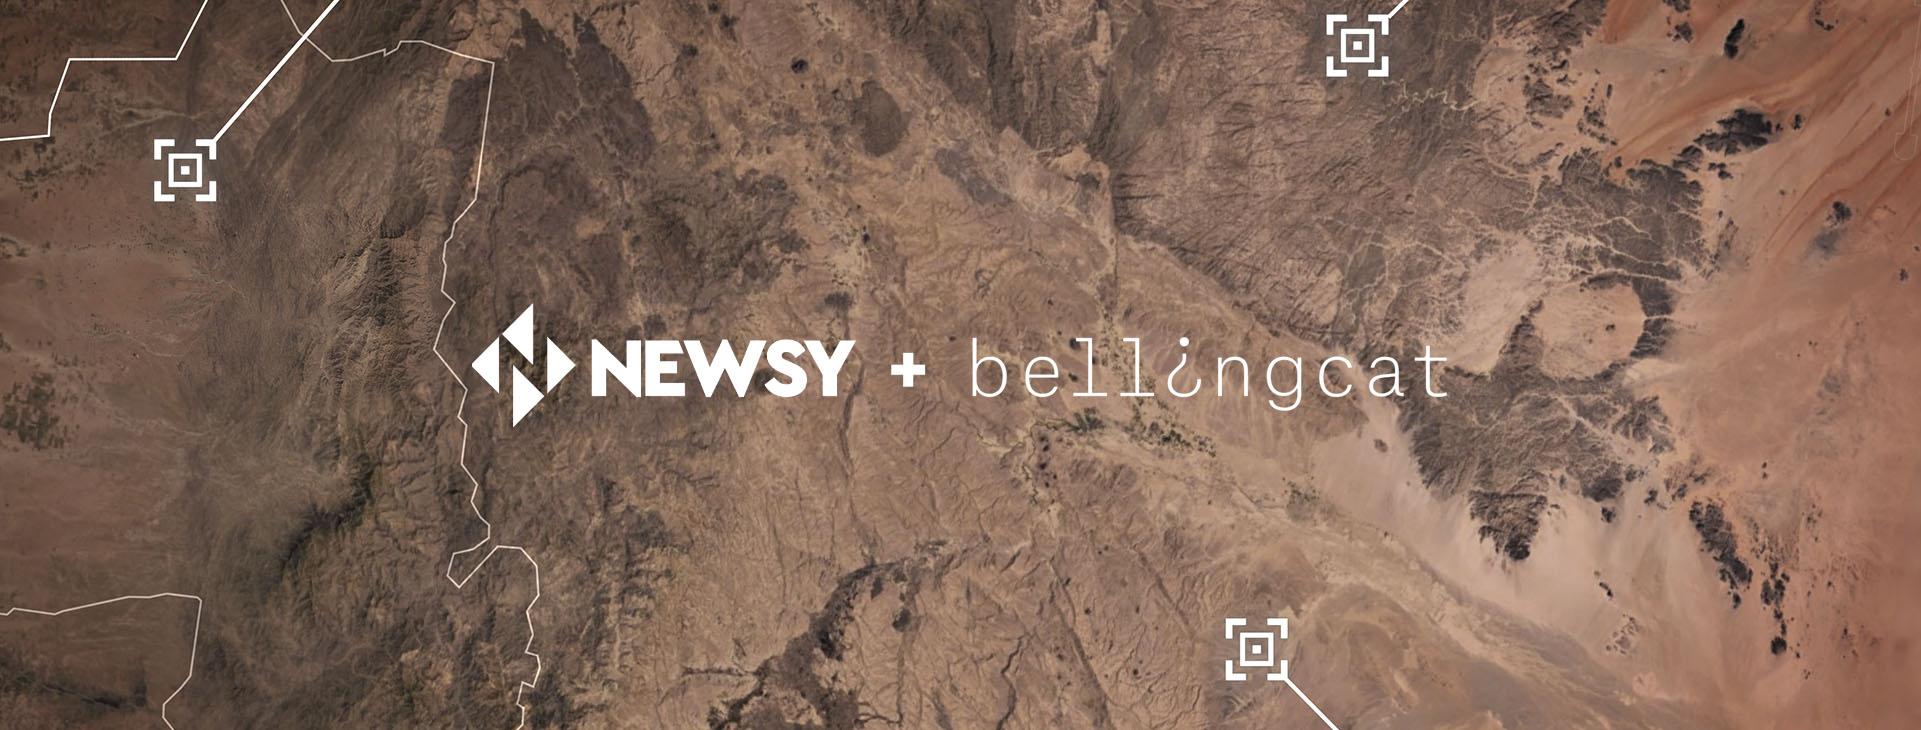 Newsy+Bellingcat